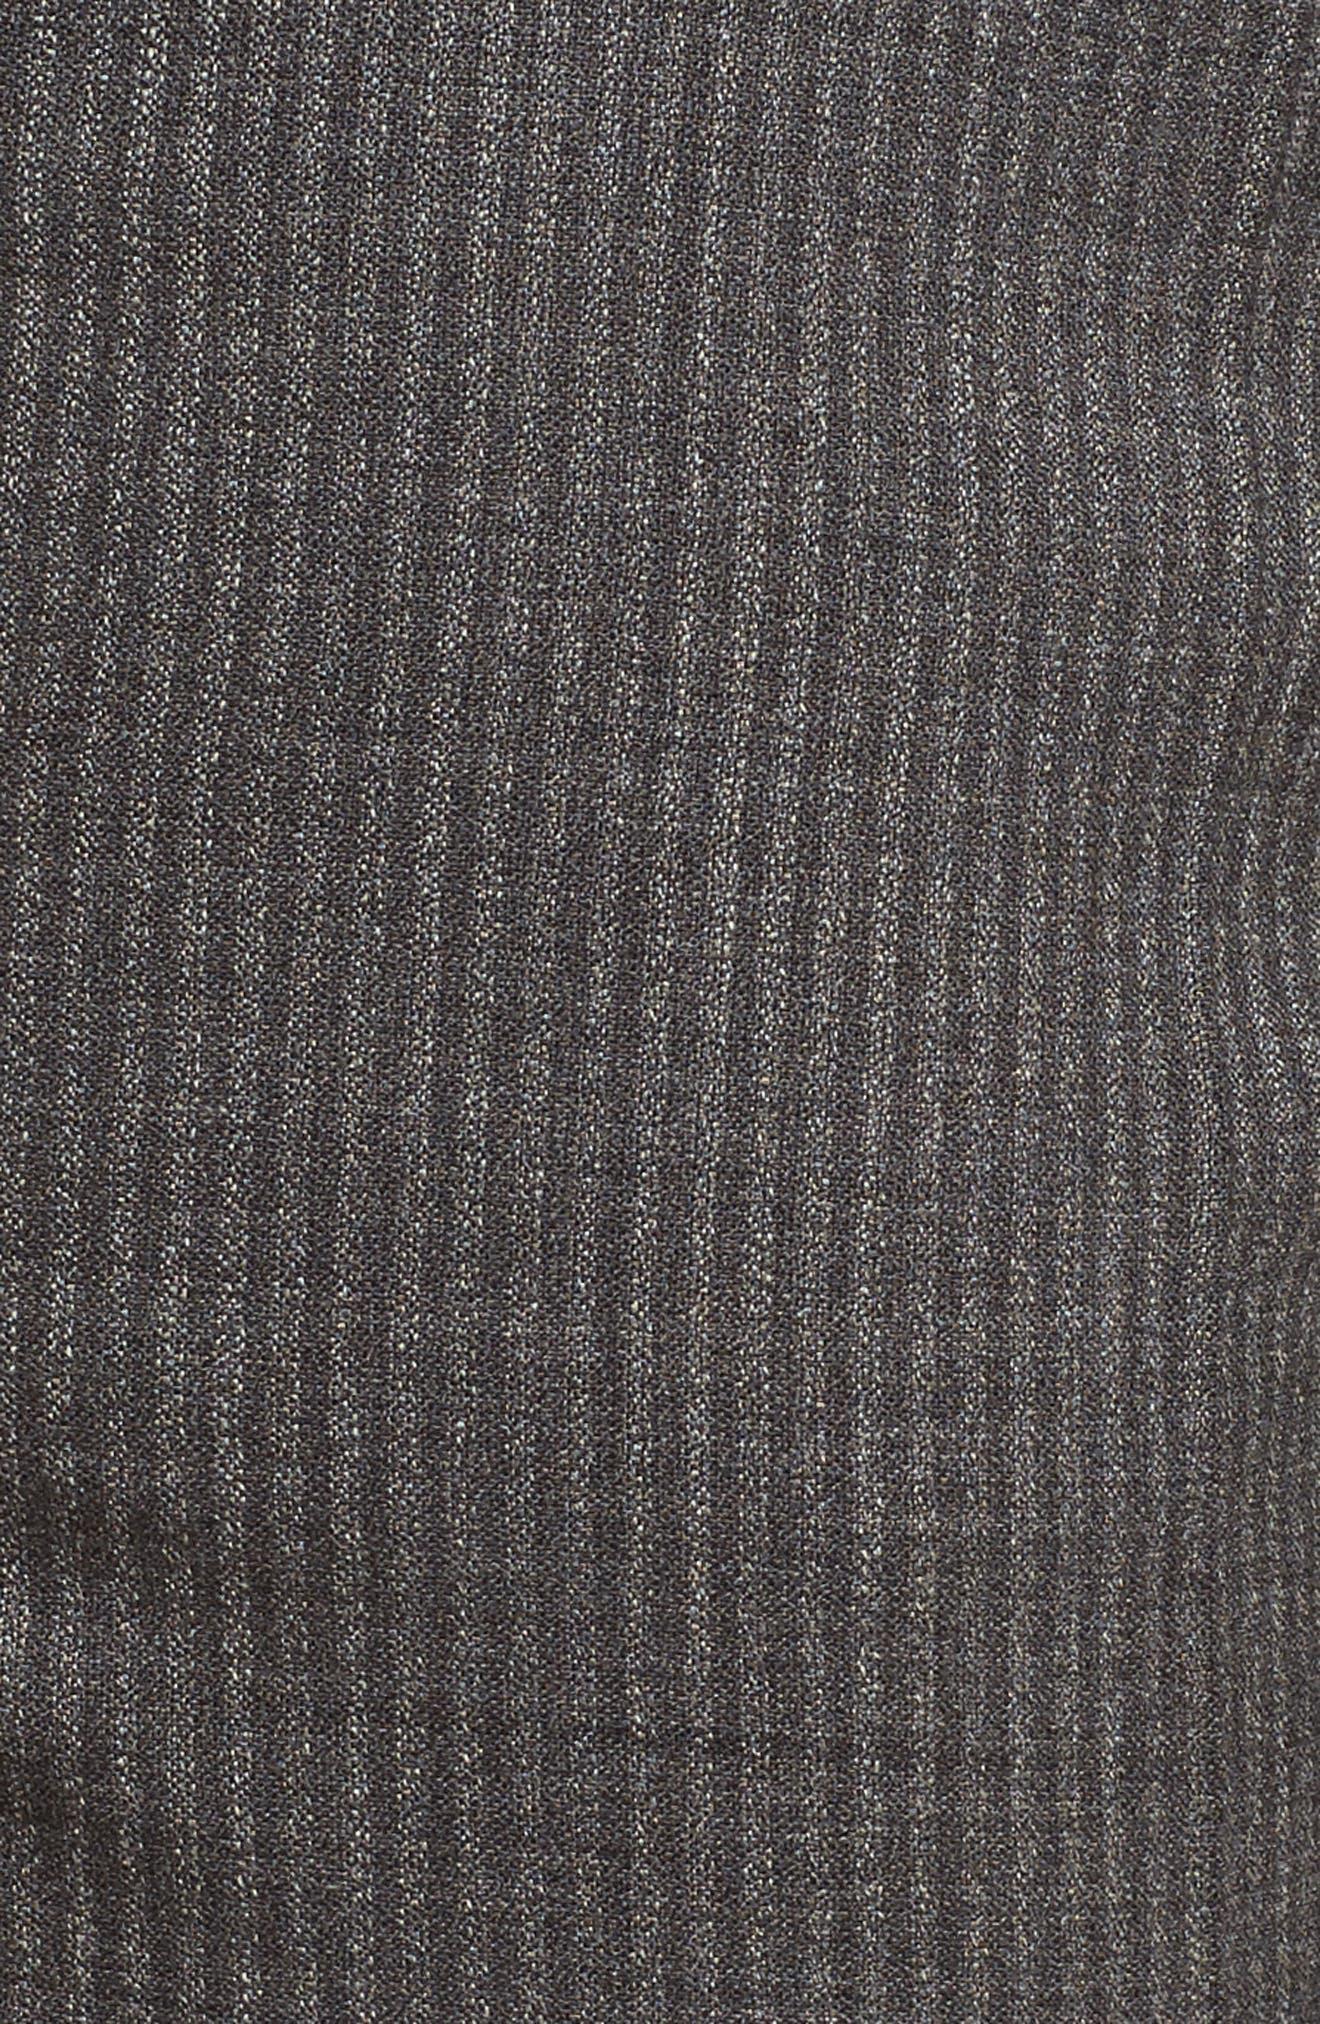 Titana Stretch Wool Trousers,                             Alternate thumbnail 5, color,                             Dark Grey Fantasy